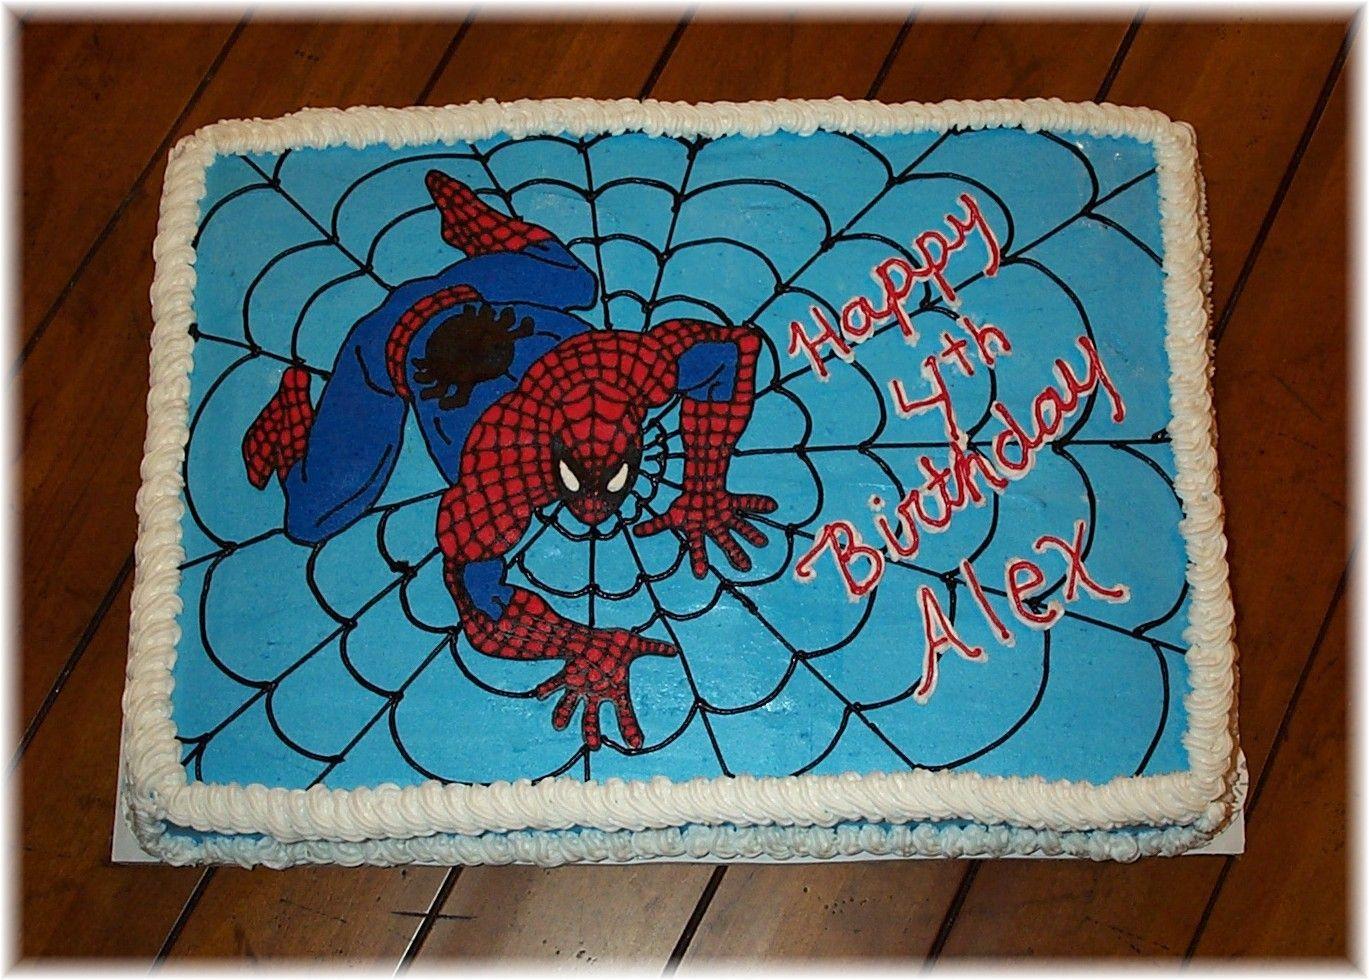 Spiderman Cake Fbct Full Sheet Cake 12 Choc 12 Yellow Butter